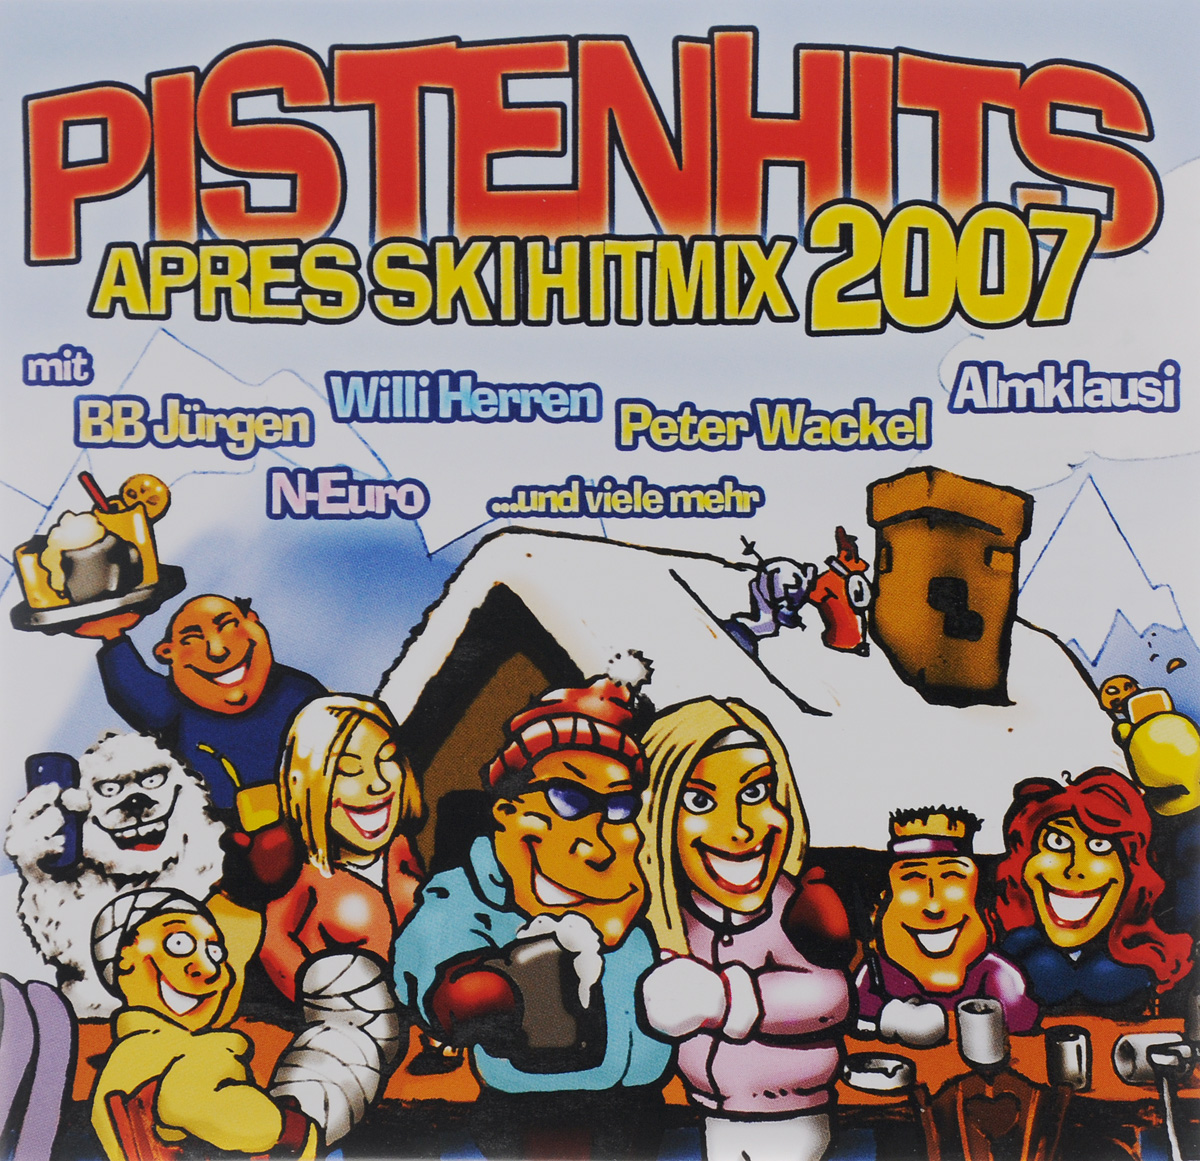 Питер Векель,Вилли Херрен,Krumel,Almklausi,Нуво Хауи,Tim Toupet,Leo Konig,Oliver Frank,Mountain Brothers,Yamboo,Dj Mox,Zascha,DJ Chriss Tuxi,A Crazy Sound Convoy,Шаун Бэйкер,Laid Back,Goleo Vi,Atomic Kitten,Mysterious Girl,Bass Up! Pistenhits. Apres Ski Hitmix 2007 (2 CD) leather s dj amdition level 2 cd